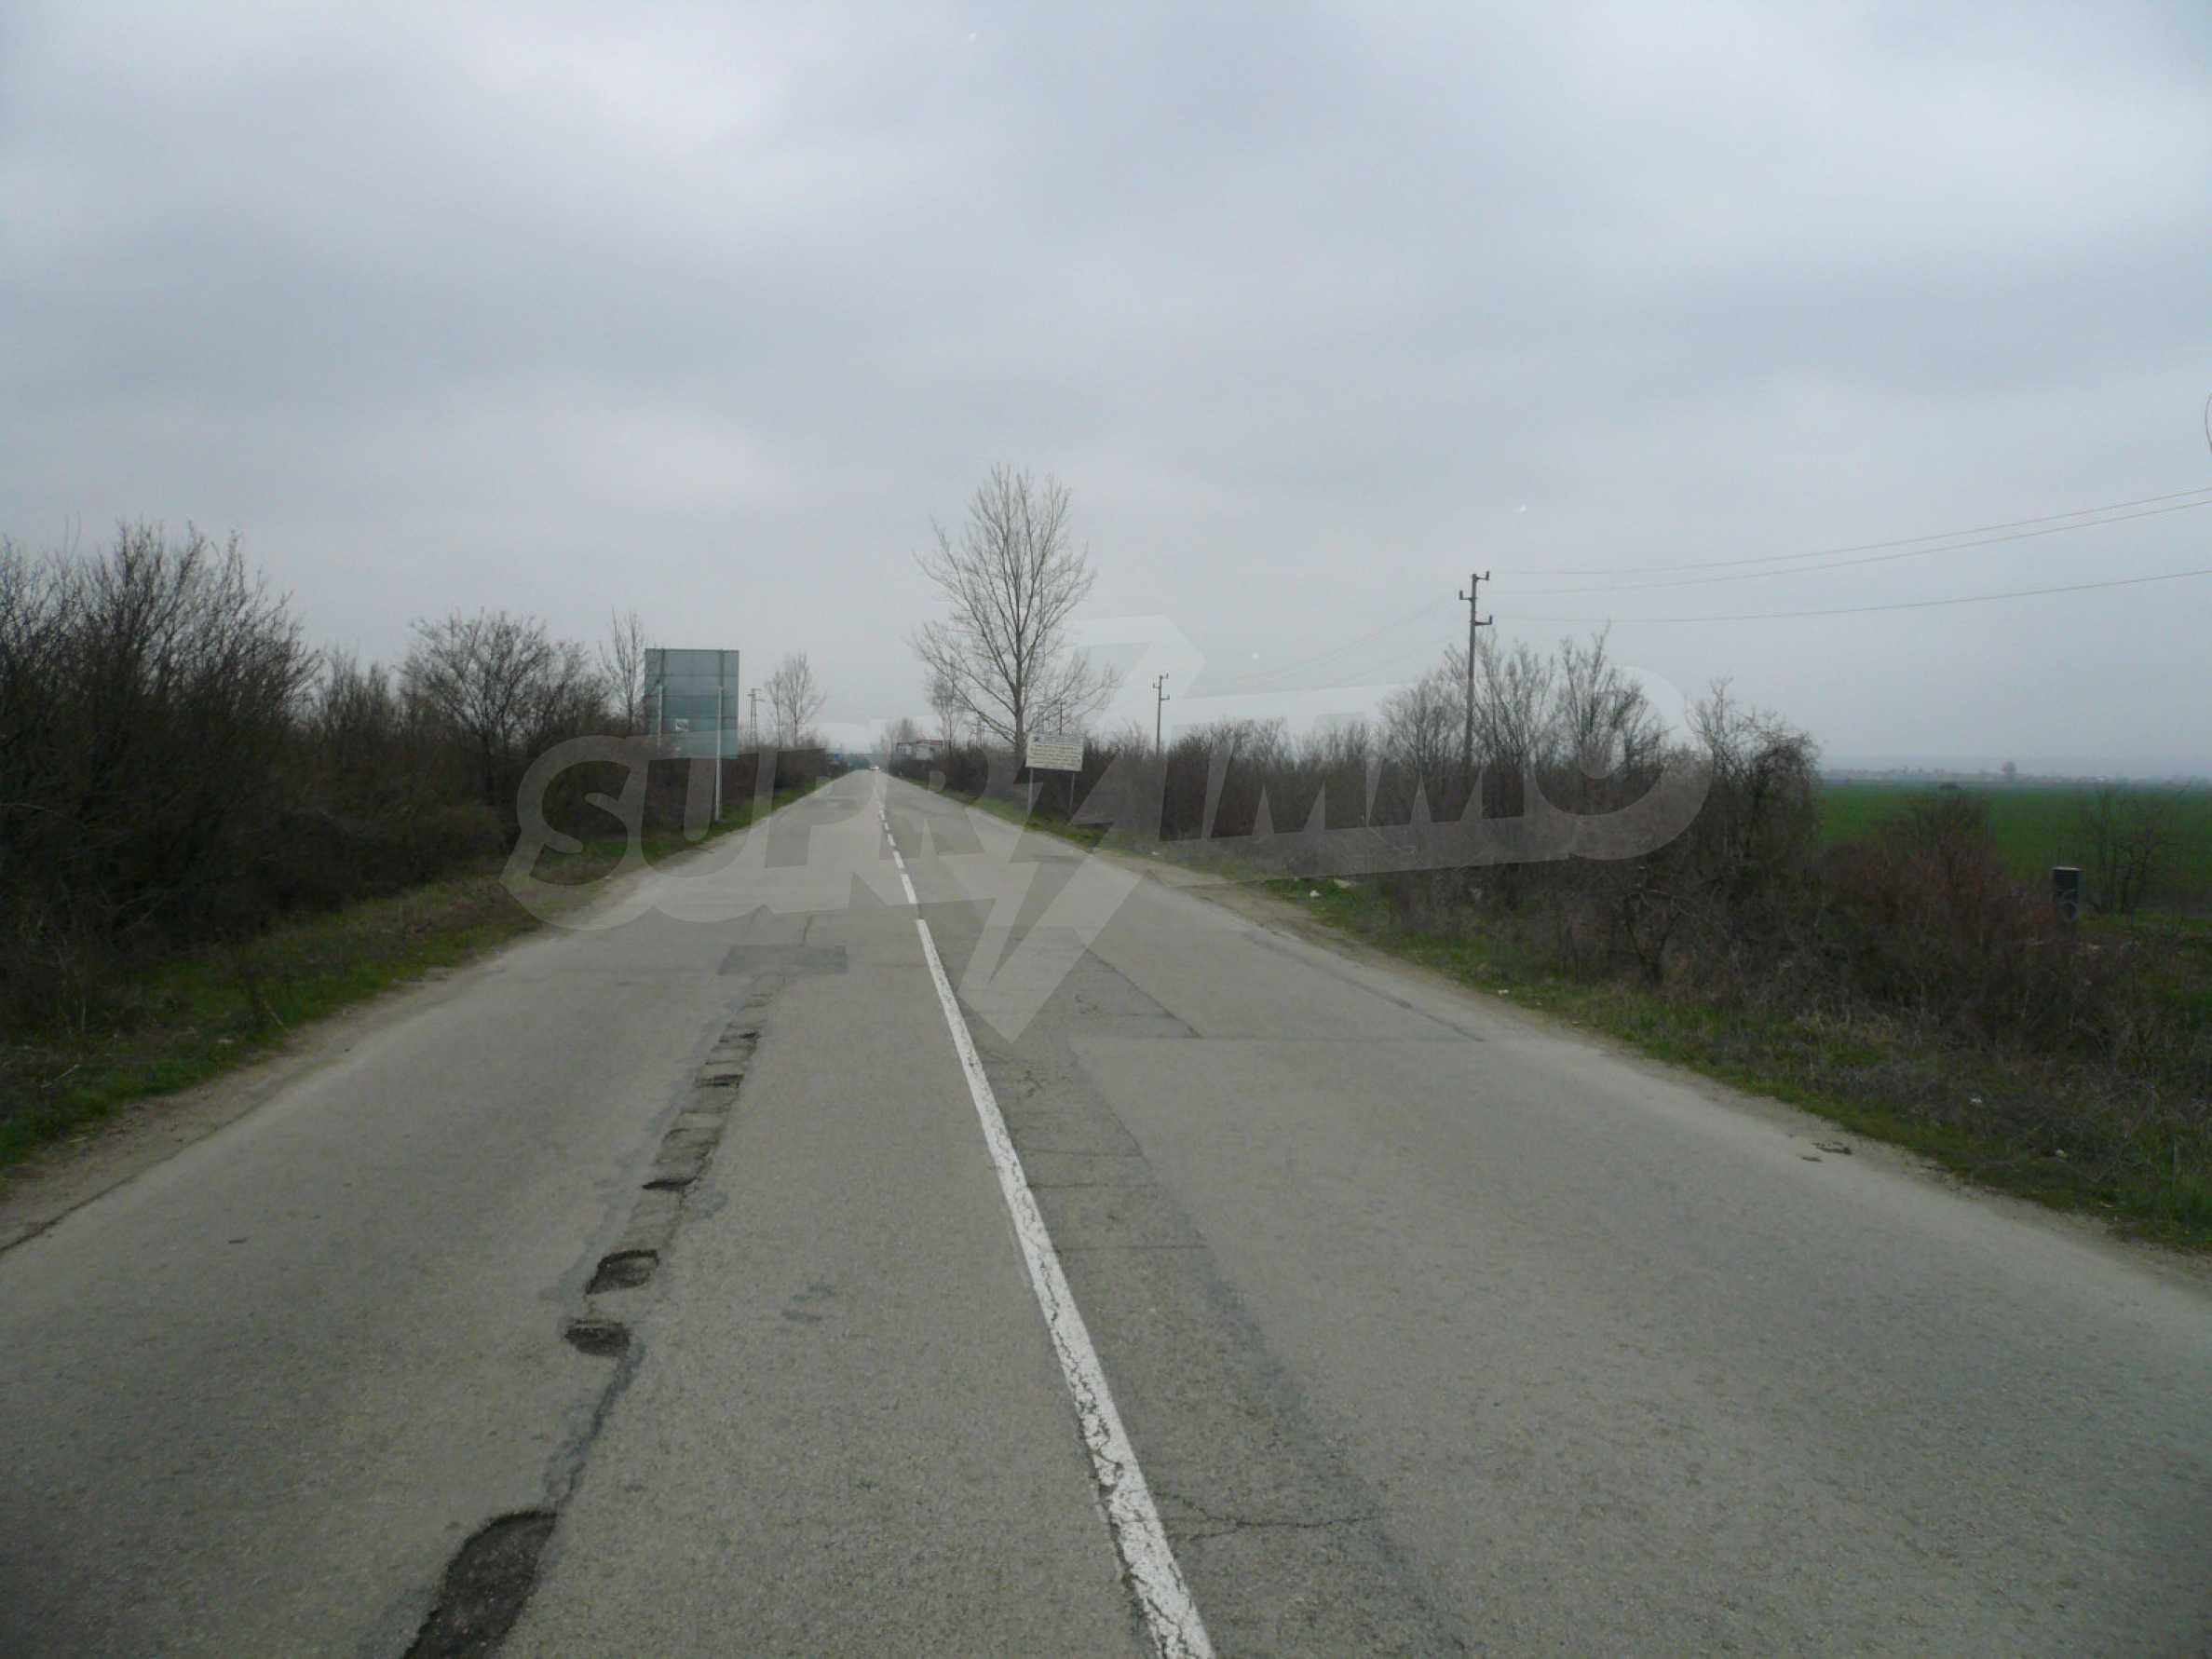 Baugrundstück auf der Asphaltstraße Vidin-Bregovo 1